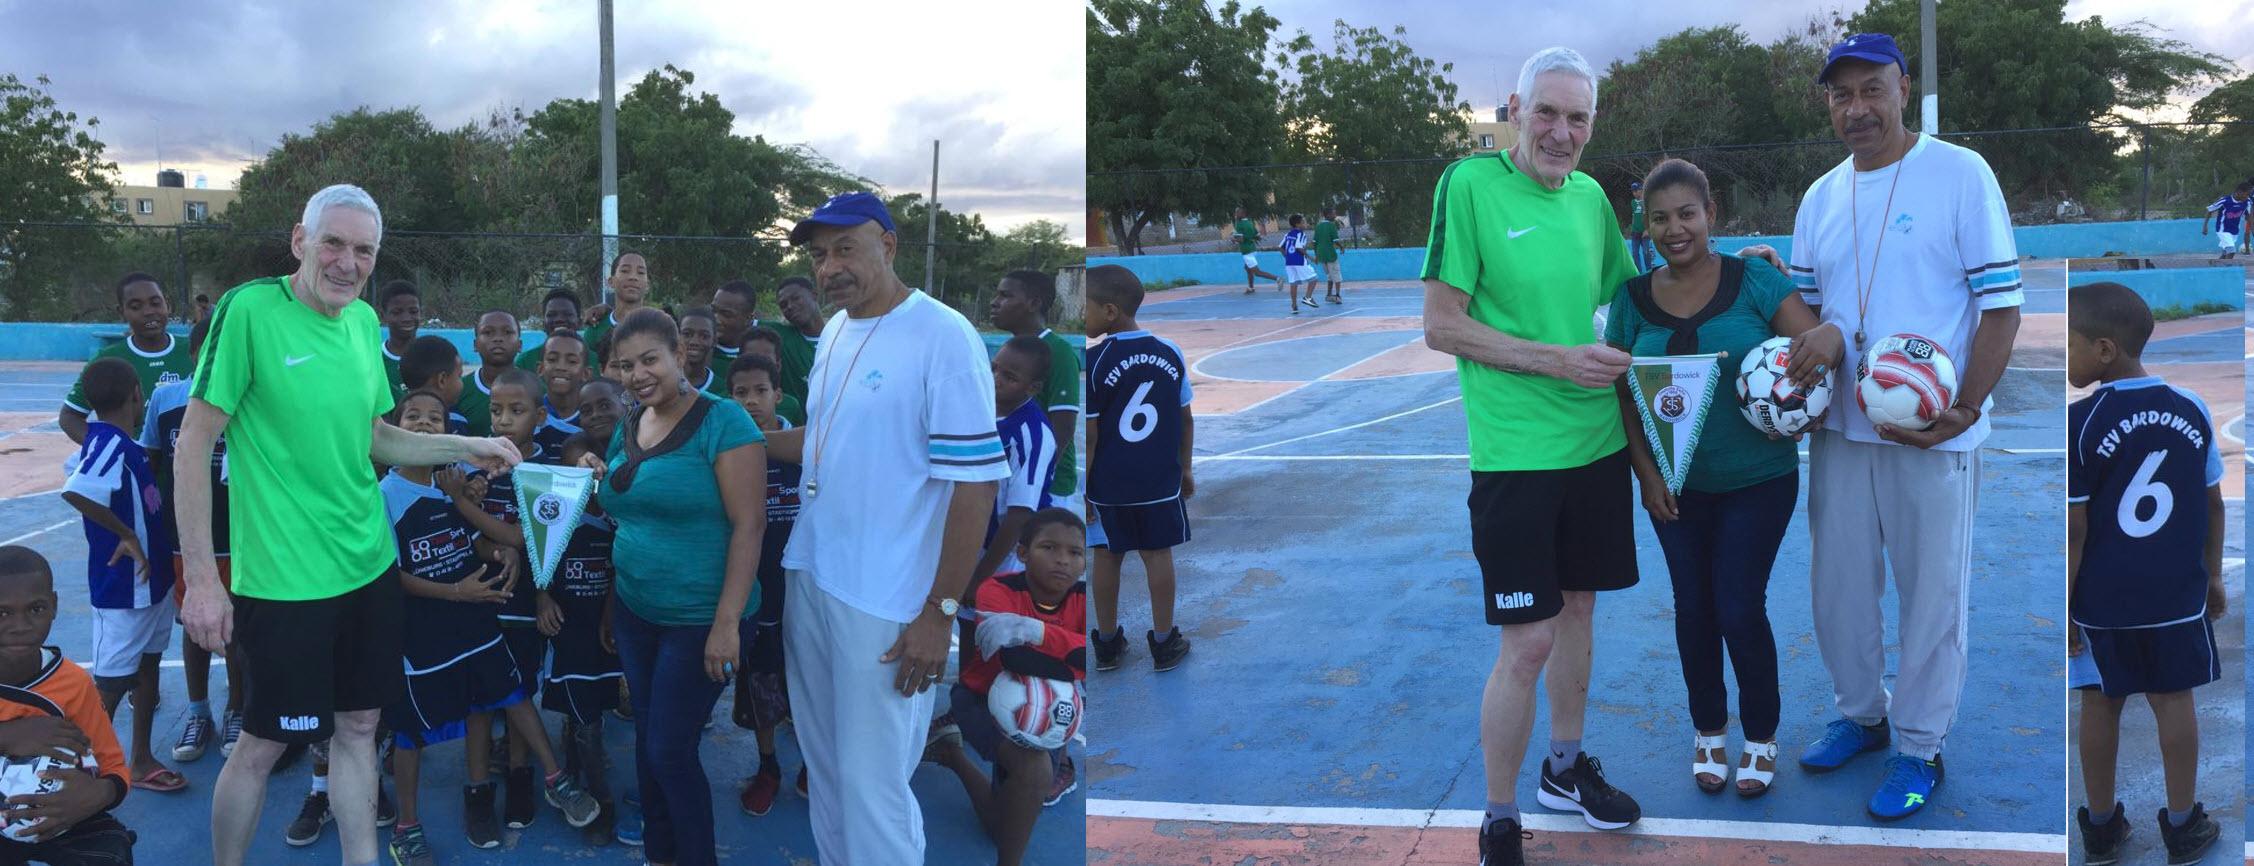 Kalle Krappel in der Dominikanischen Republik